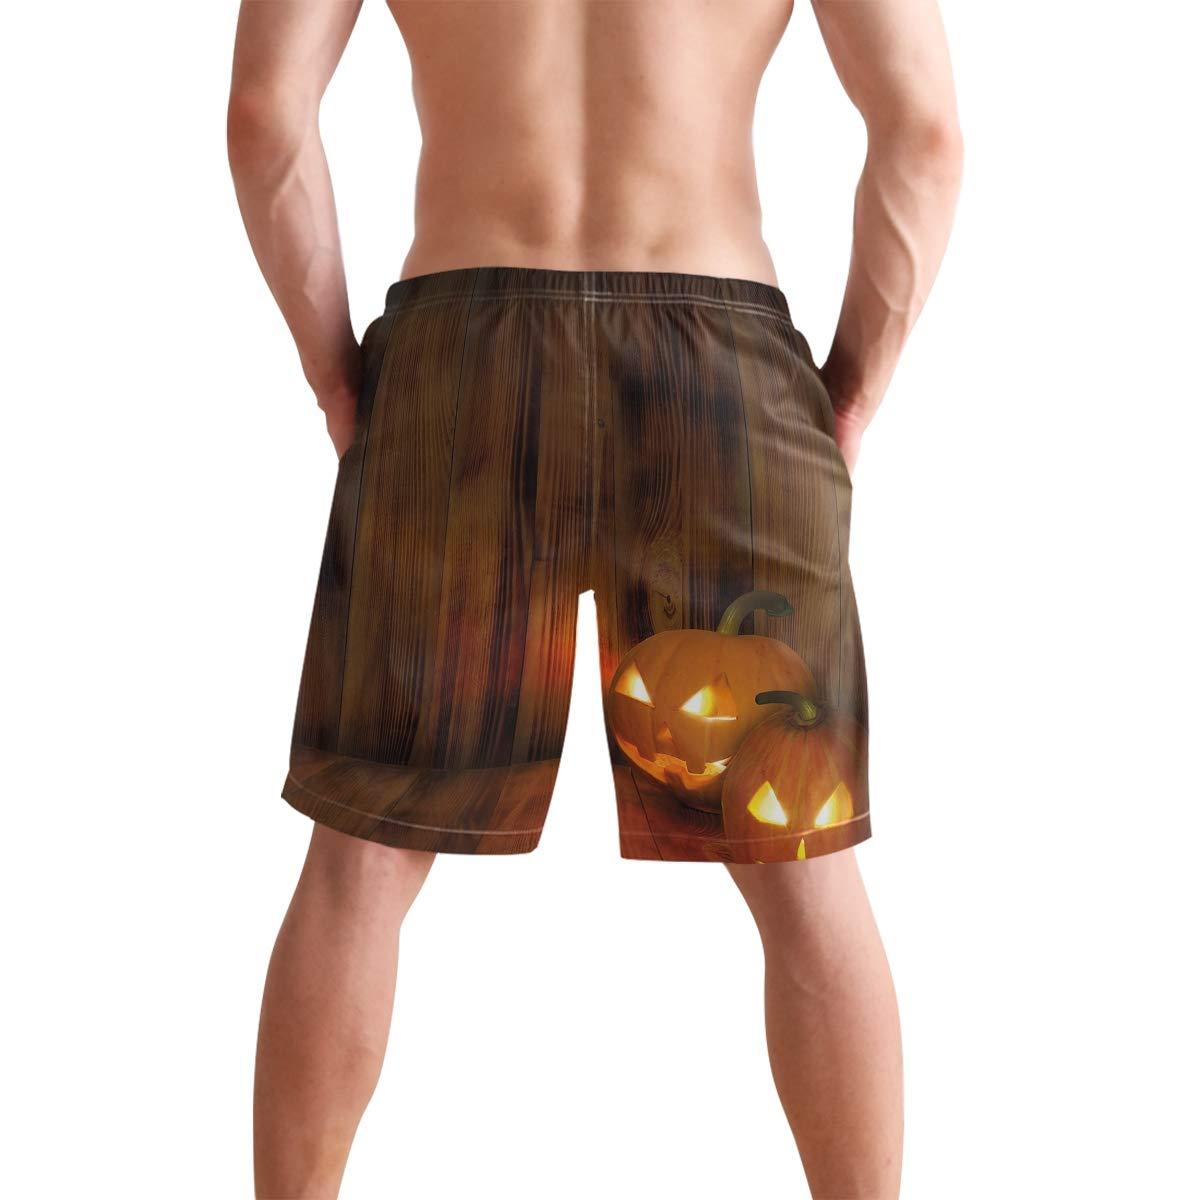 COVASA Mens Summer ShortsJack O Lanterns Scary Halloween Photograph in Wooden